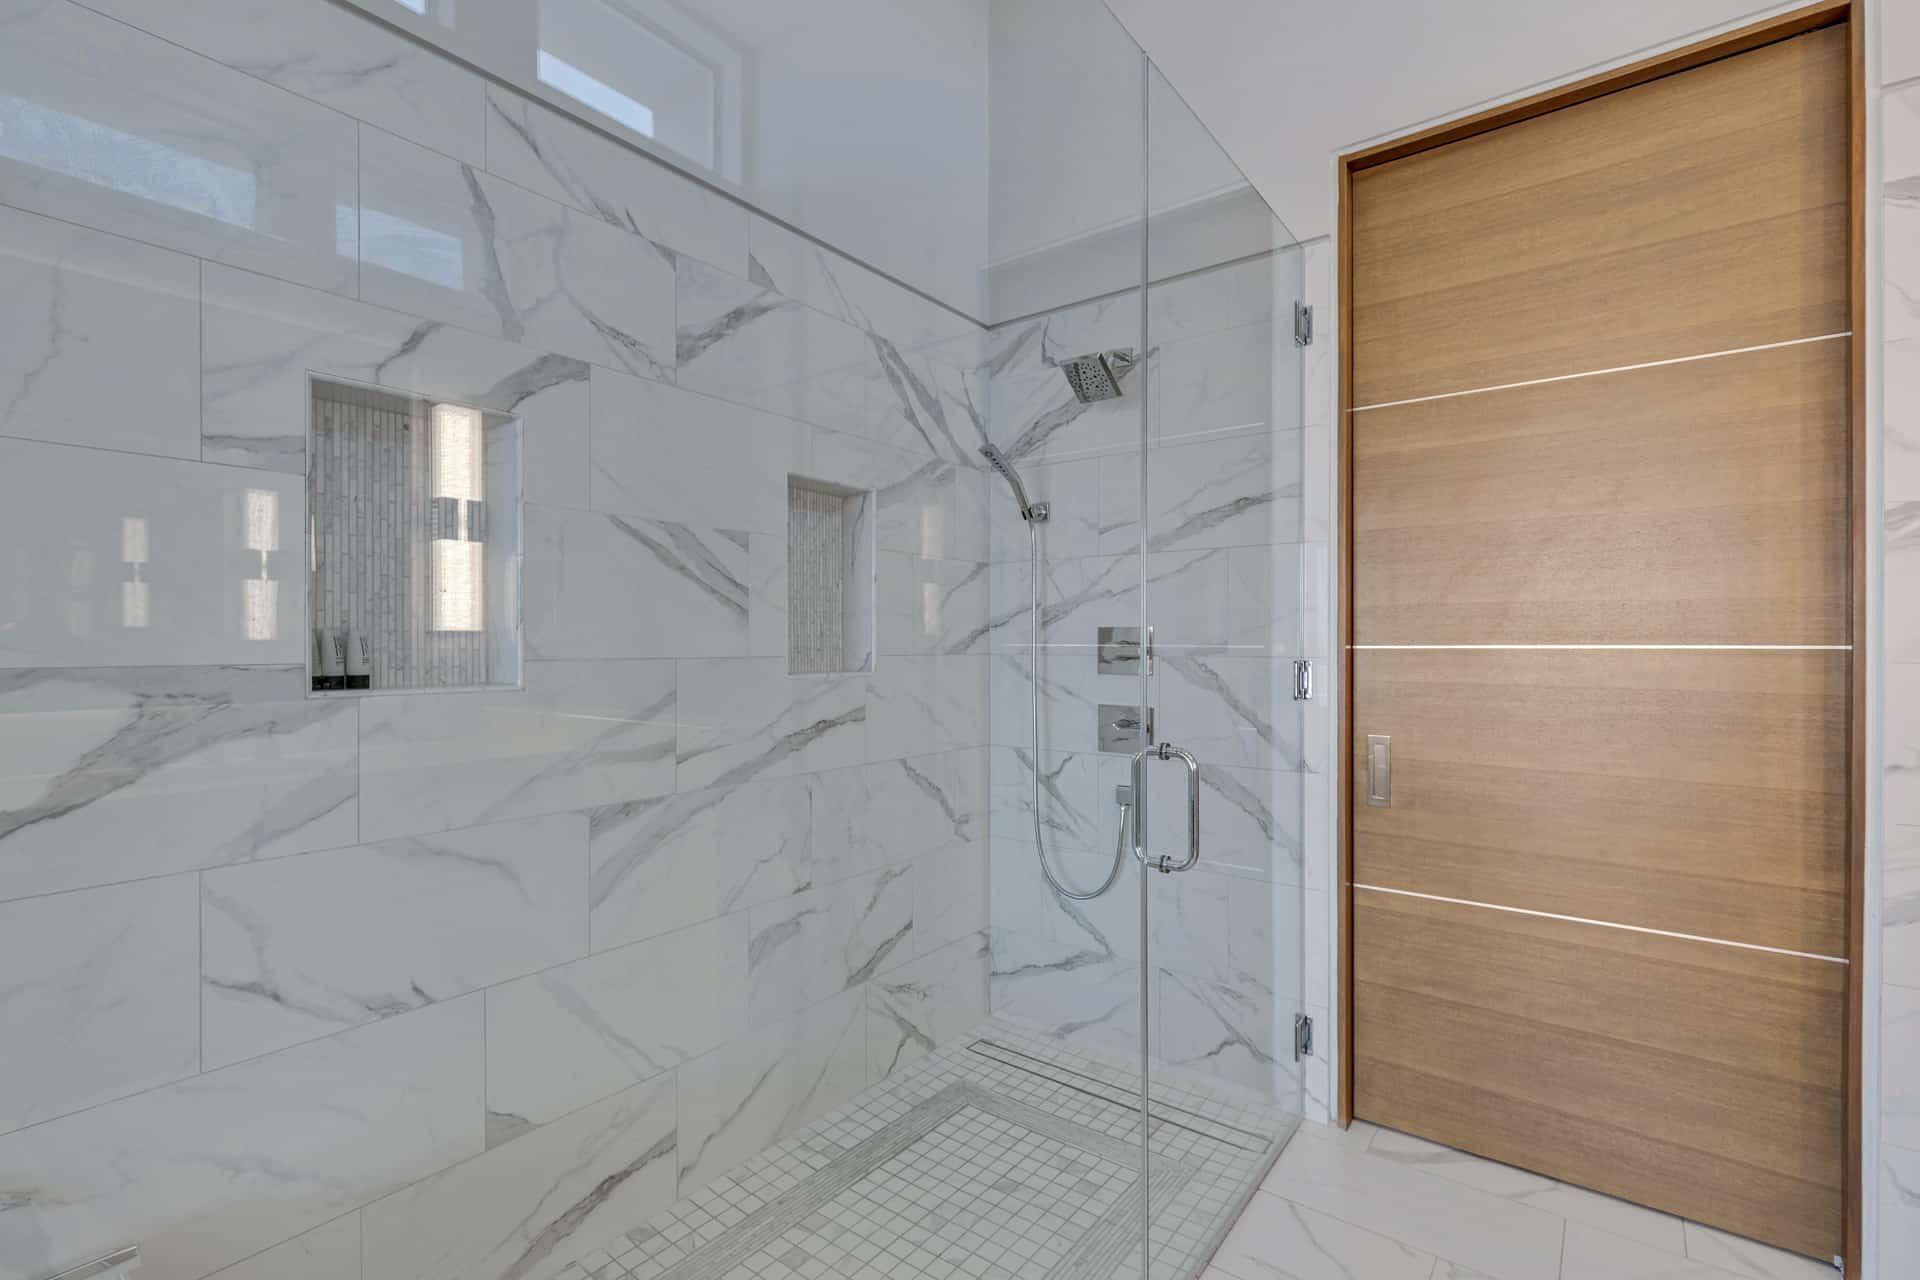 las-vegas-luxry-real-estate-realtor-rob-jensen-company-5-rockstream-drive-ascaya048